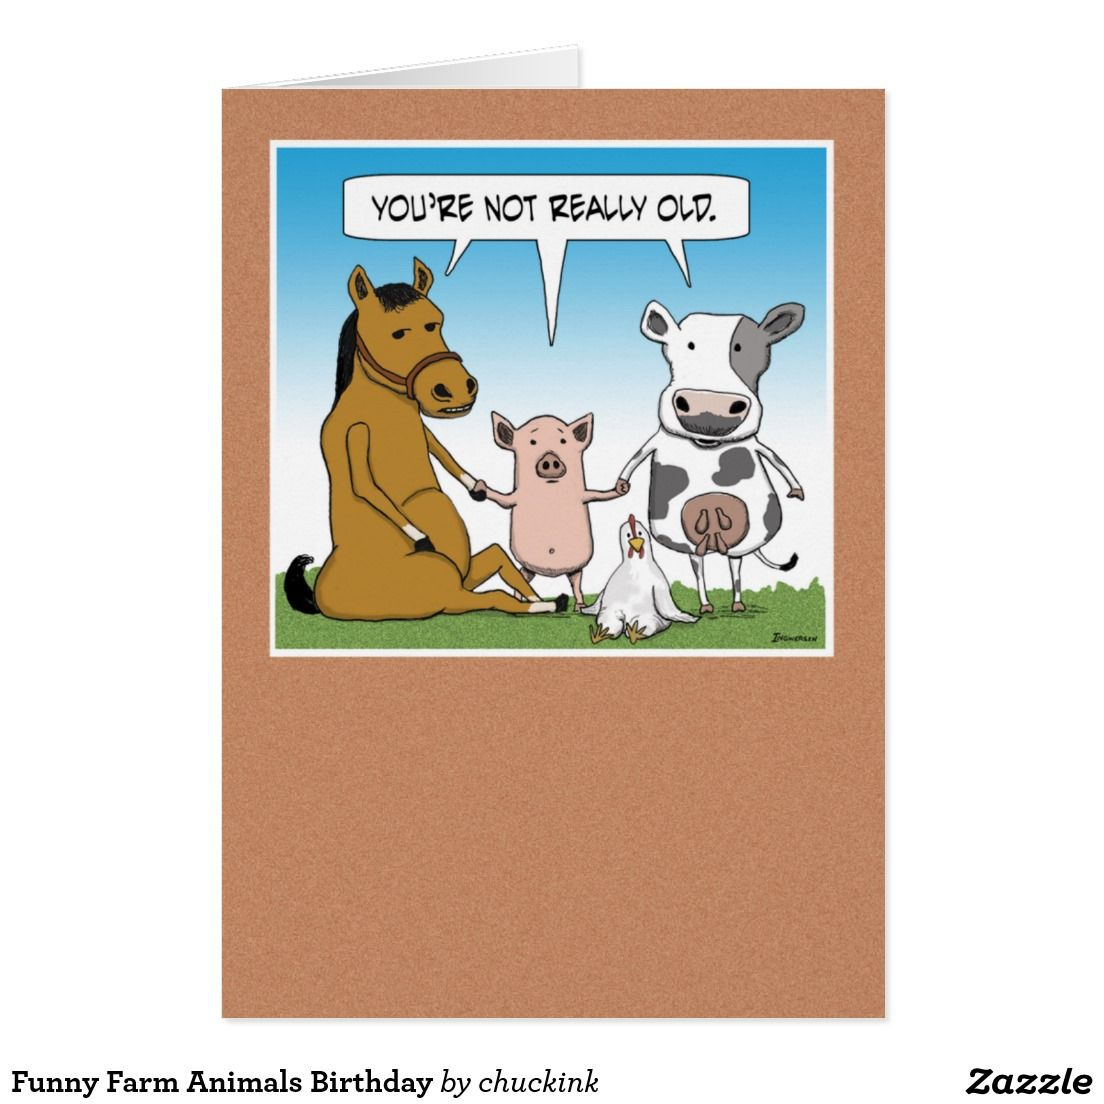 Funny Farm Animals Birthday Card Zazzle Com In 2021 Farm Animal Birthday Animal Birthday Funny Birthday Pictures